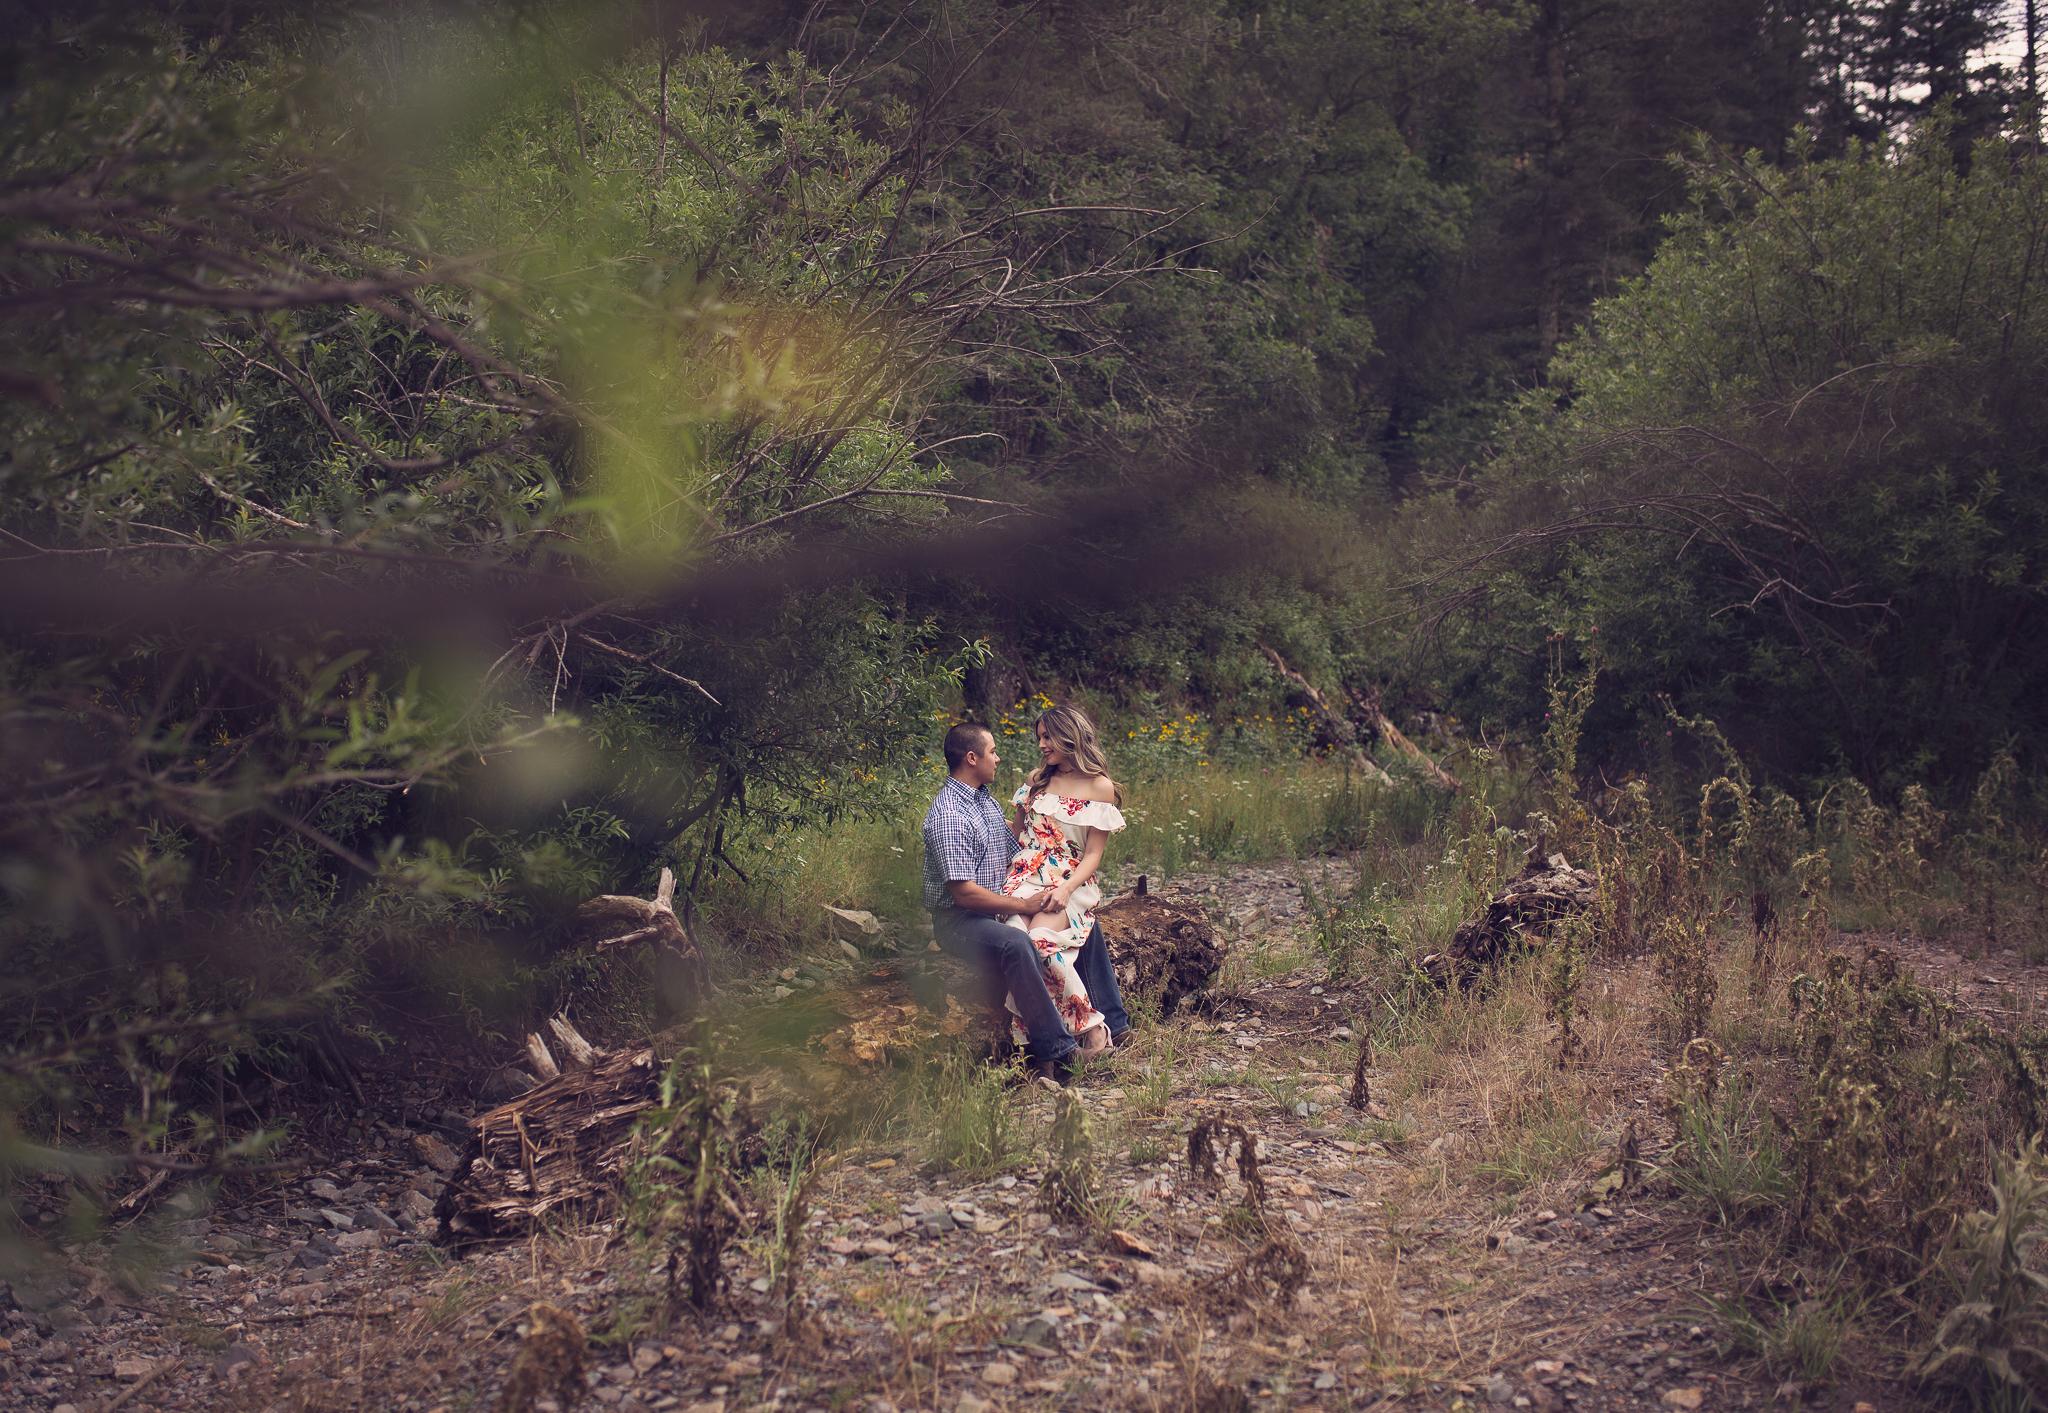 richard-guerra-photography-wedding-quinceañera-senior-family-maternity-children-cake-smash-photographer-portraits-southeastern-new-mexico-west-texas-hobbs-eunice-jal-lovington-lubbock-odessa-midland-seminole-seagraves-andrews-brownfield